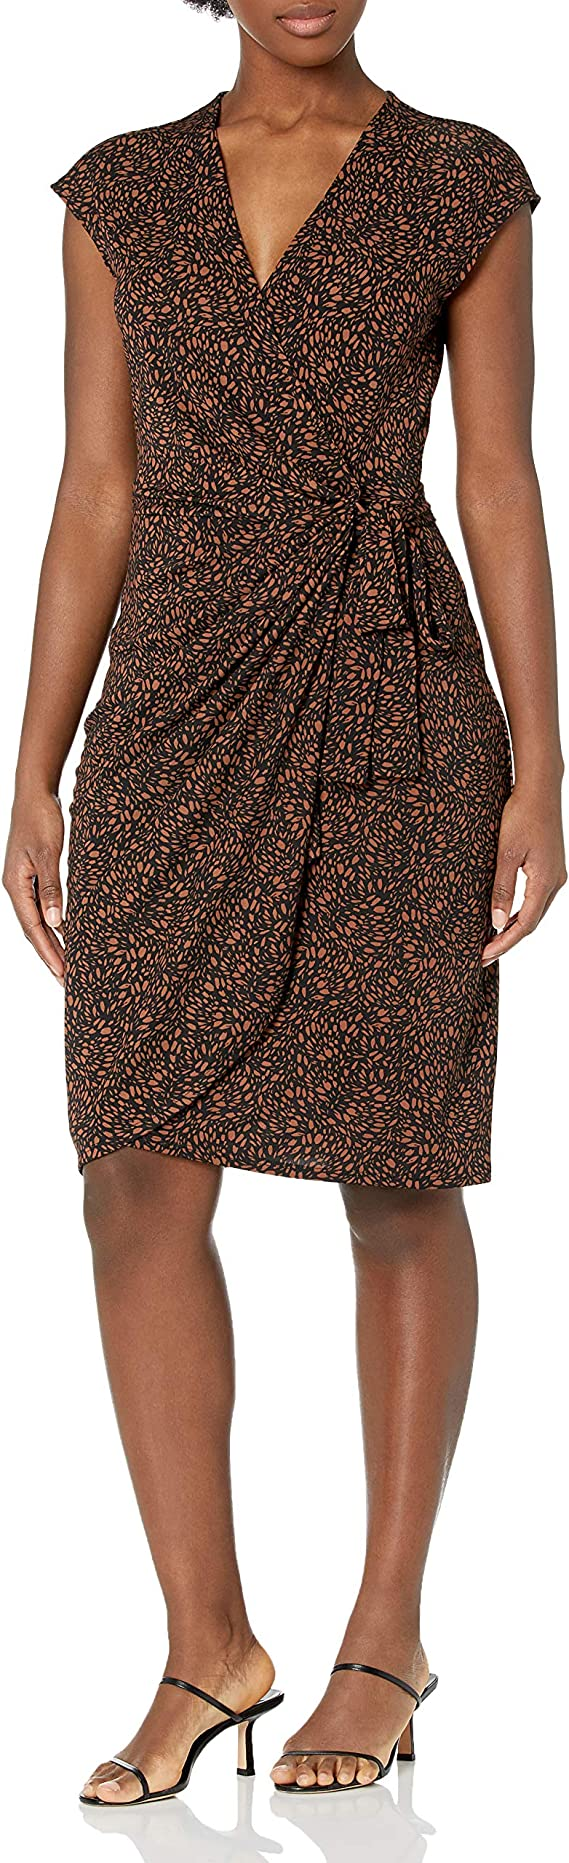 2X Navy Lark /& Ro Women/'s Plus Size Classic Cap Sleeve Wrap Dress